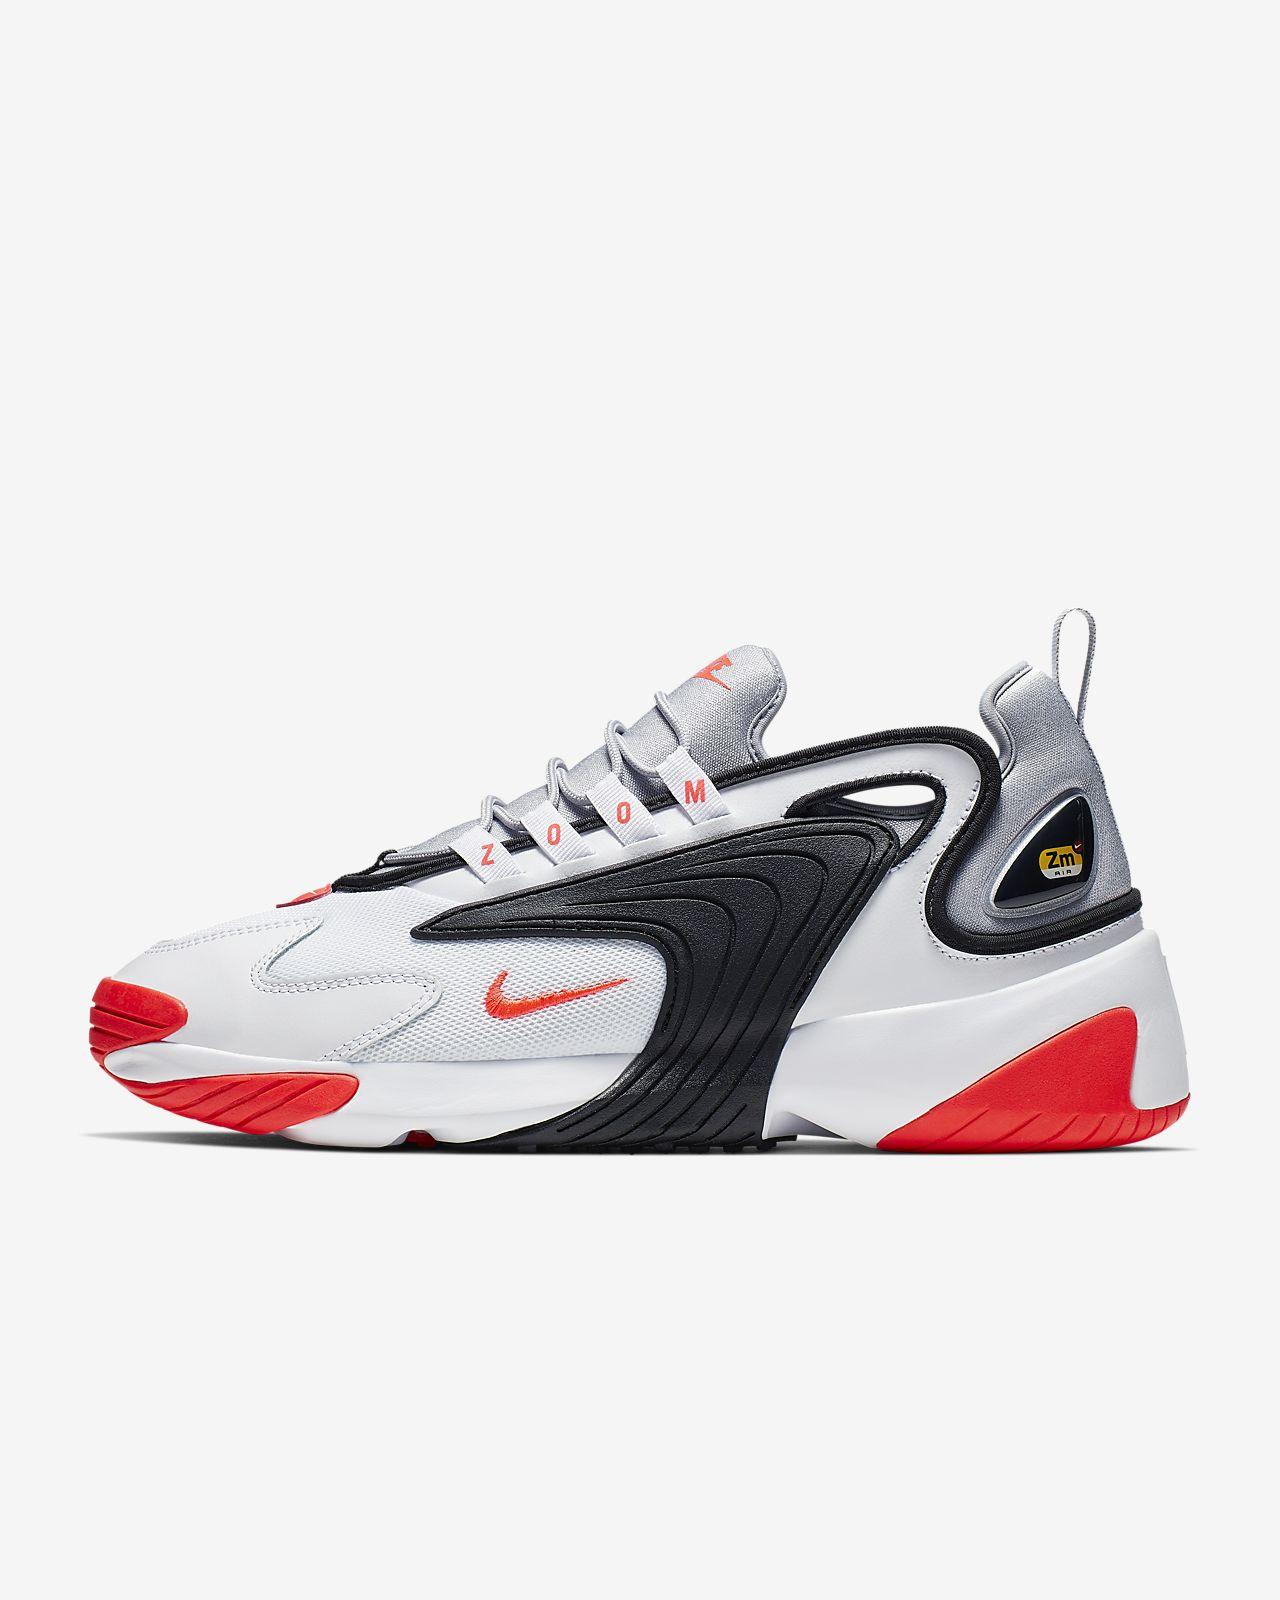 chaussure nike 2k zoom